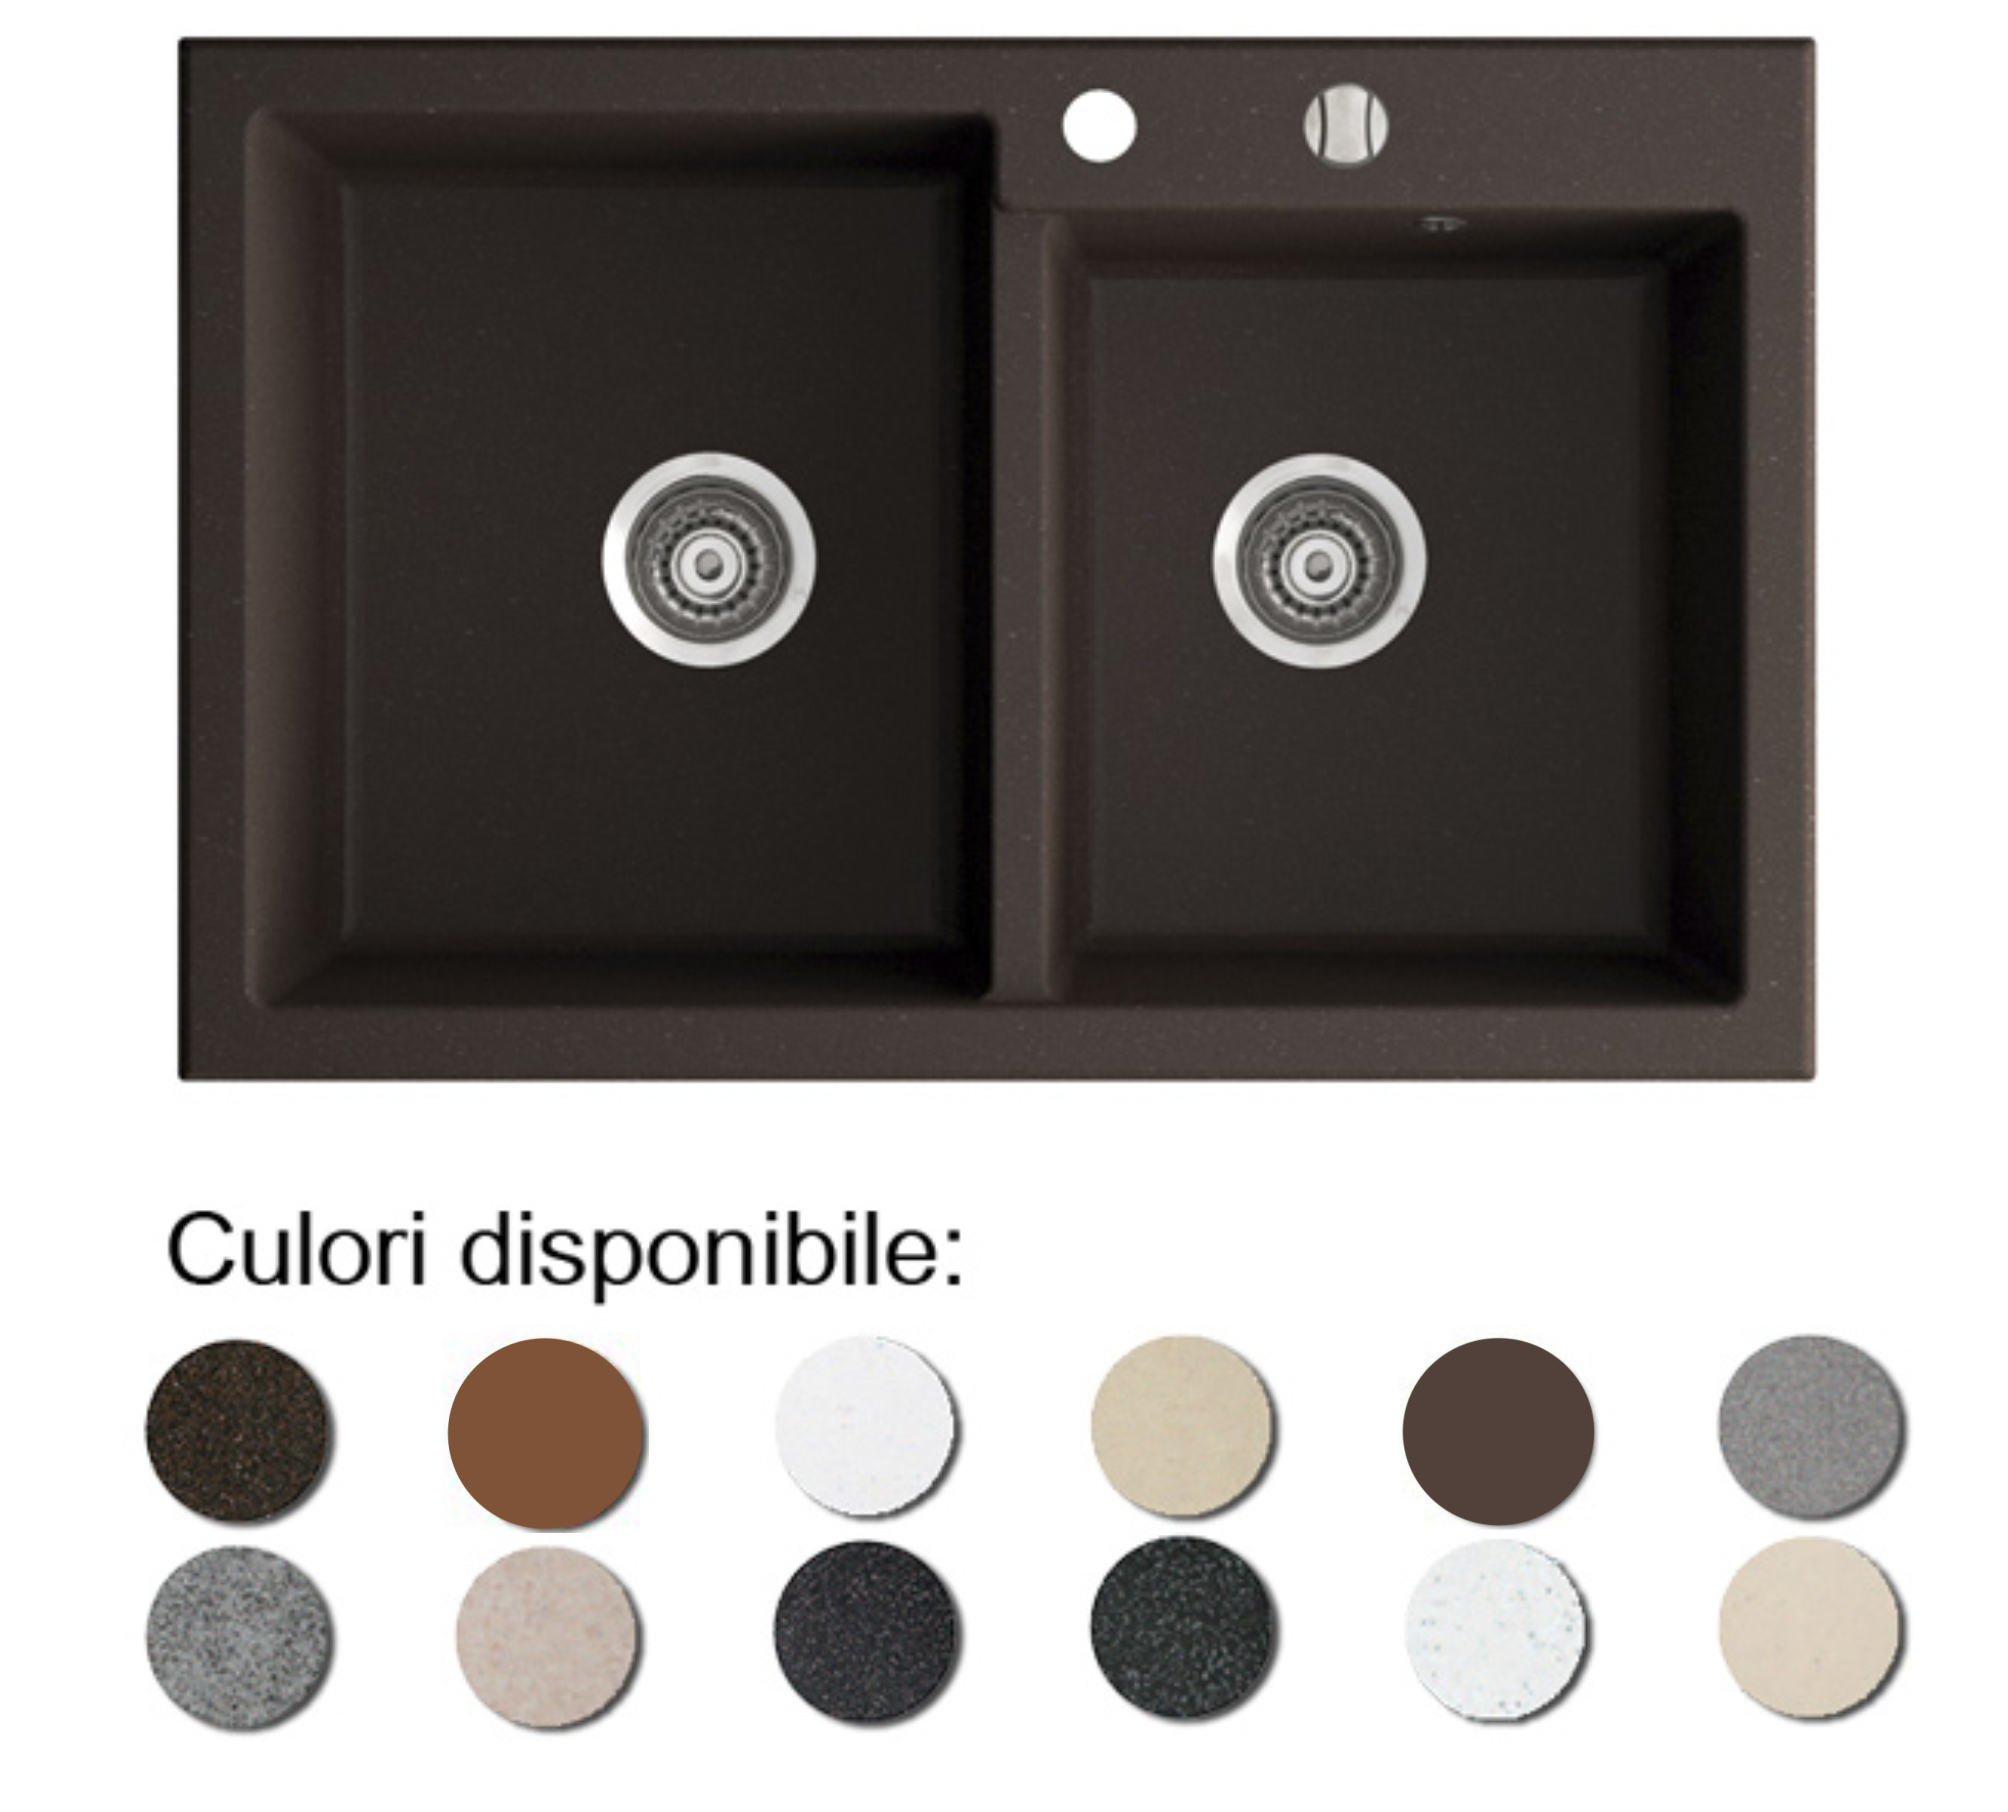 Chiuveta Bucatarie Granit Compozit Anticalcar Cuve Poza